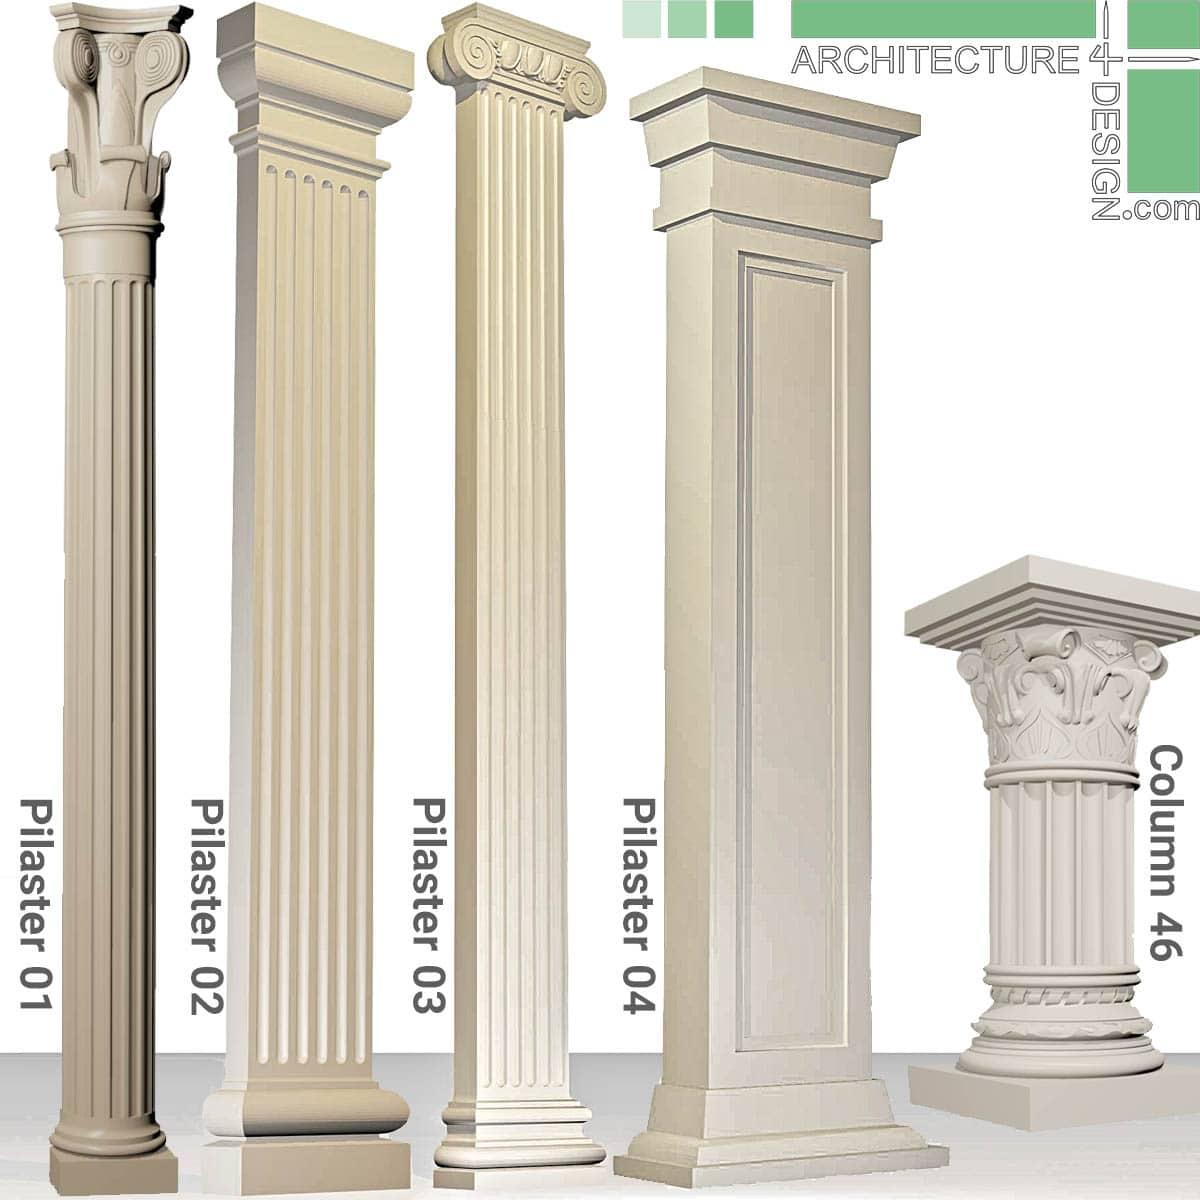 Original United States Capitol Columns at the National